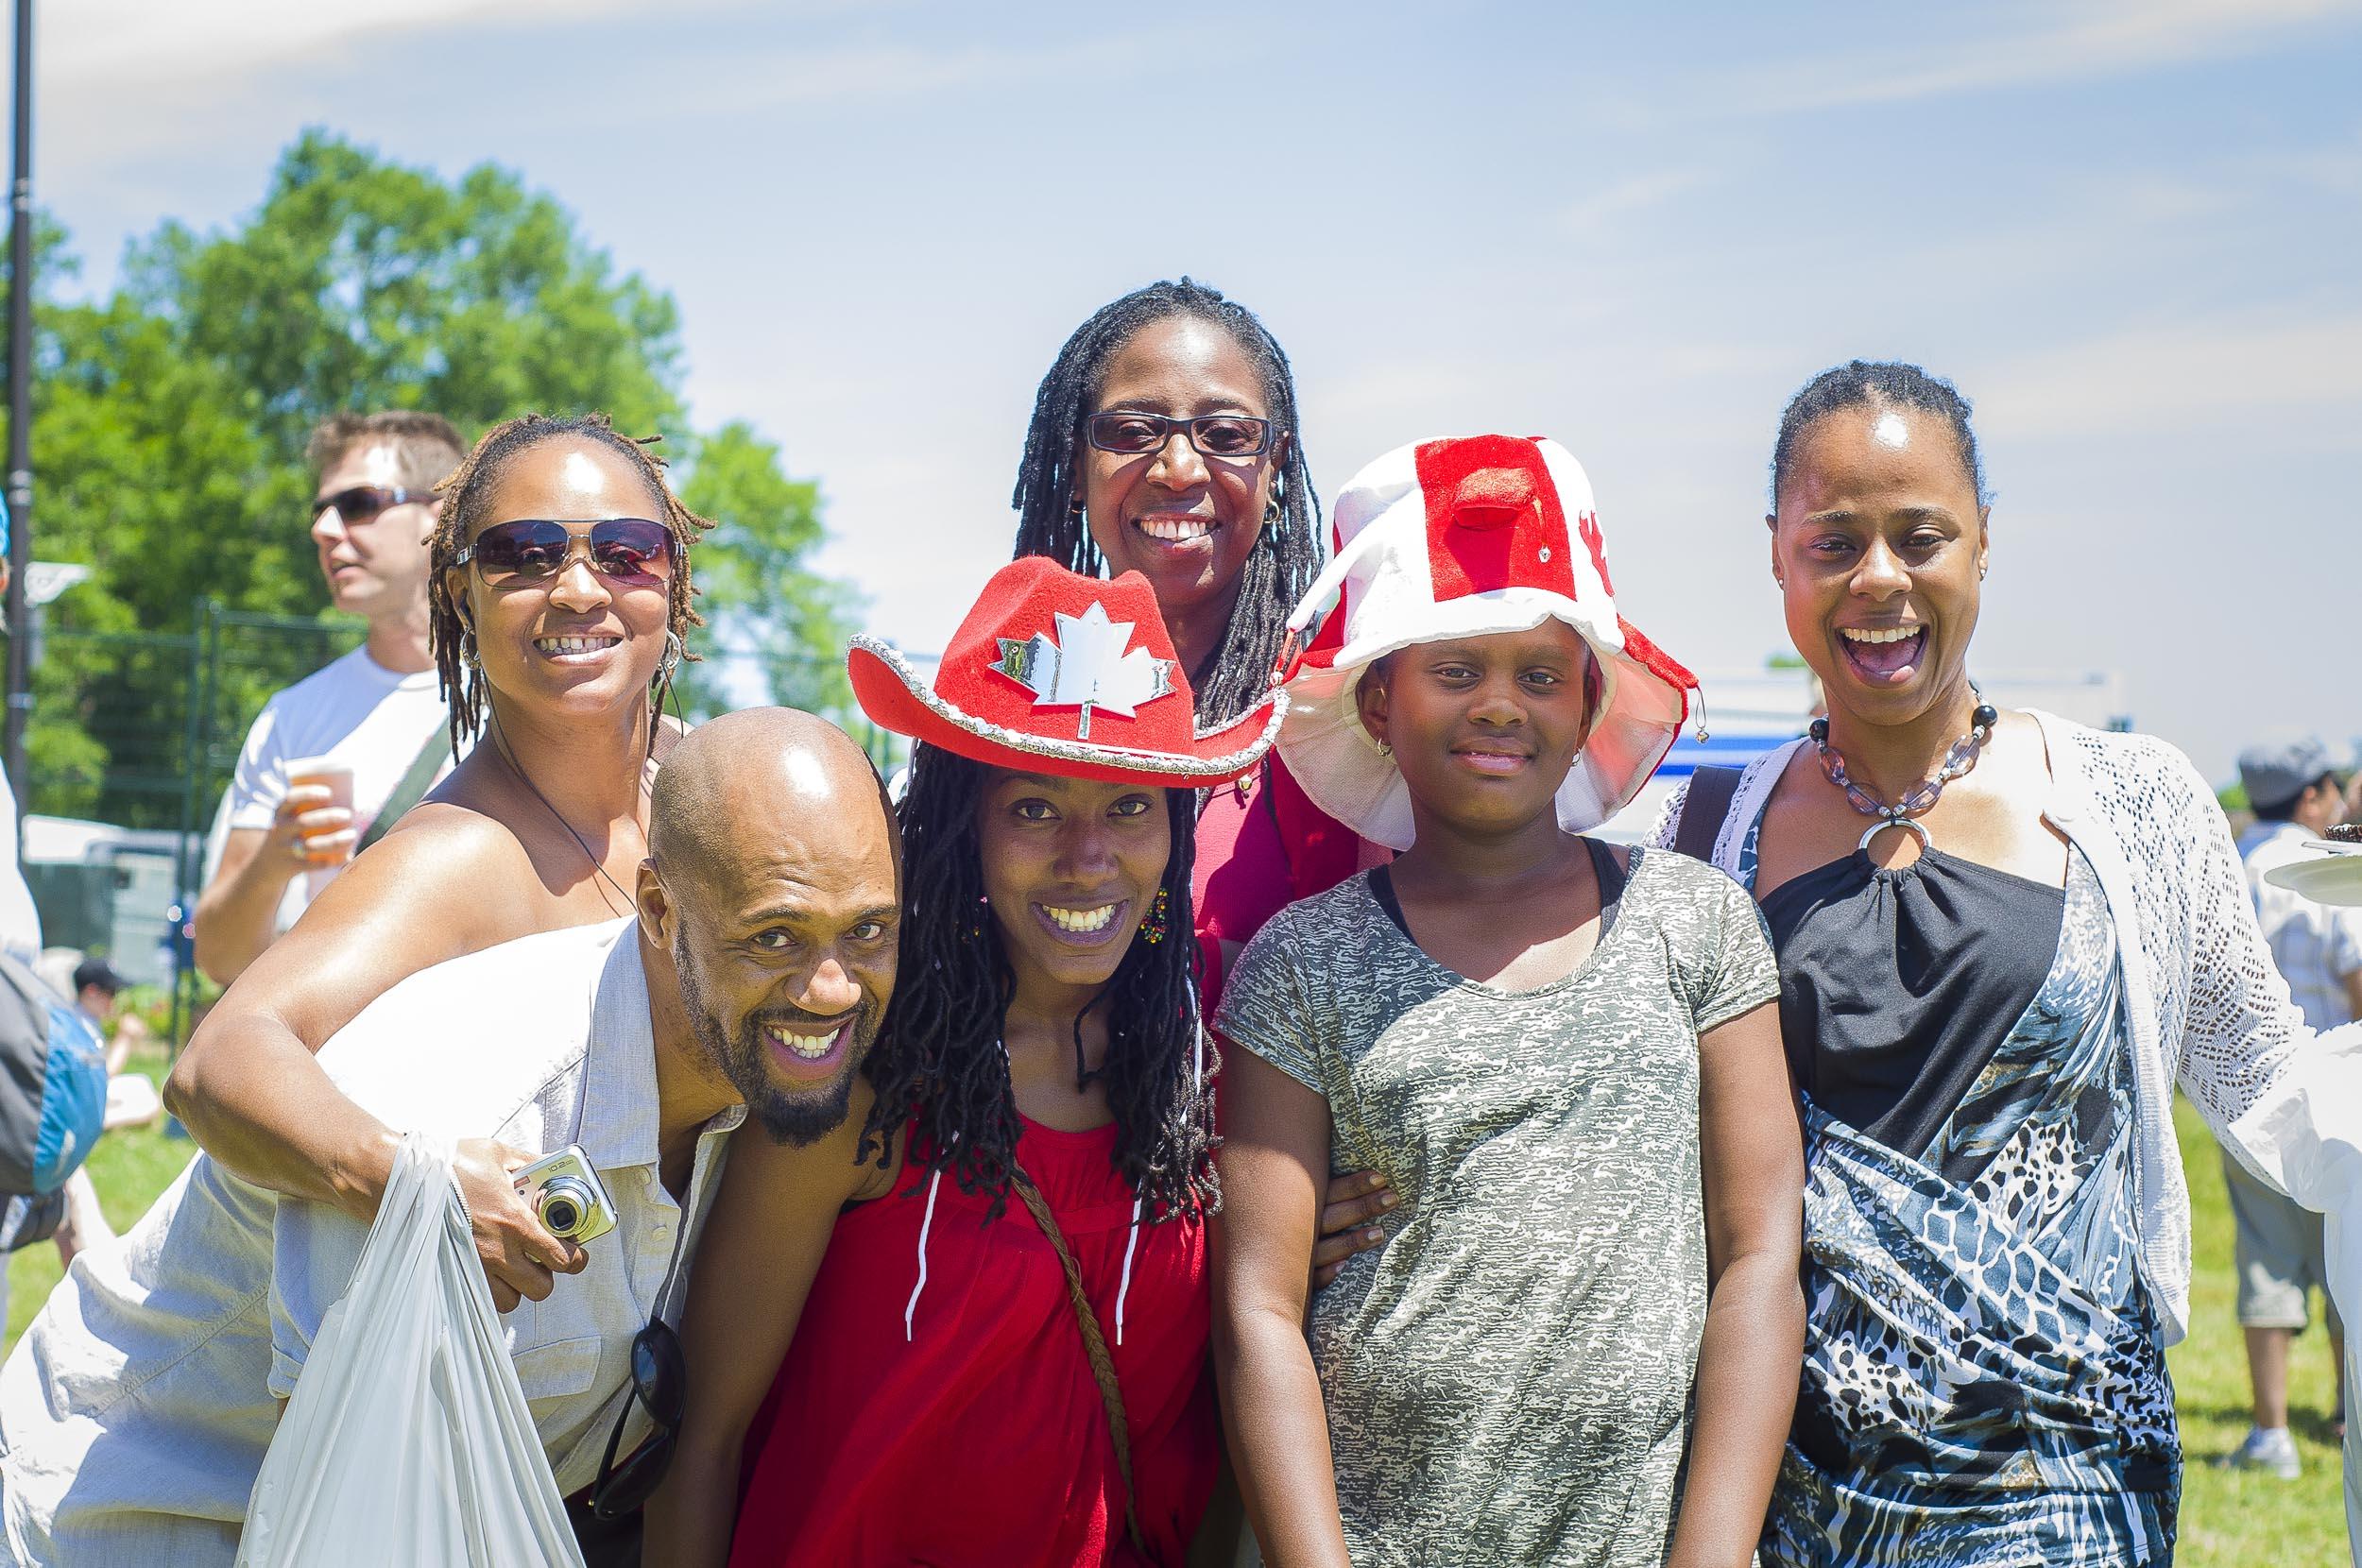 Canadian Citizenship Ceremony-Ribfest -745398251.jpg